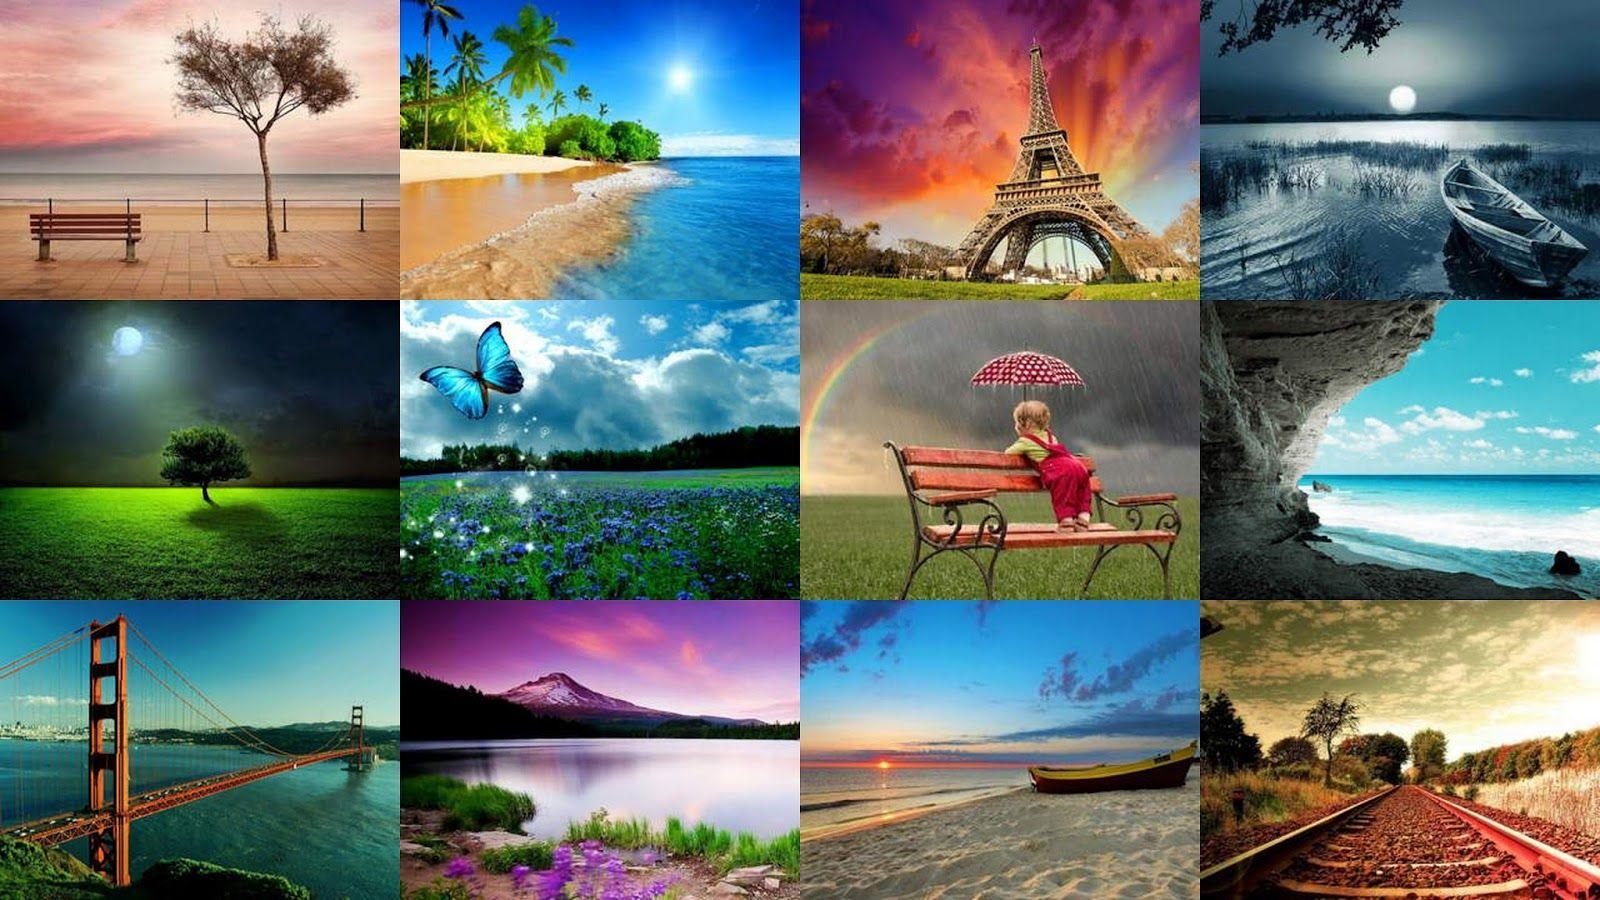 Download 320x240 Nature Wallpapers Pack Nature Wallpaper Wallpaper Painting